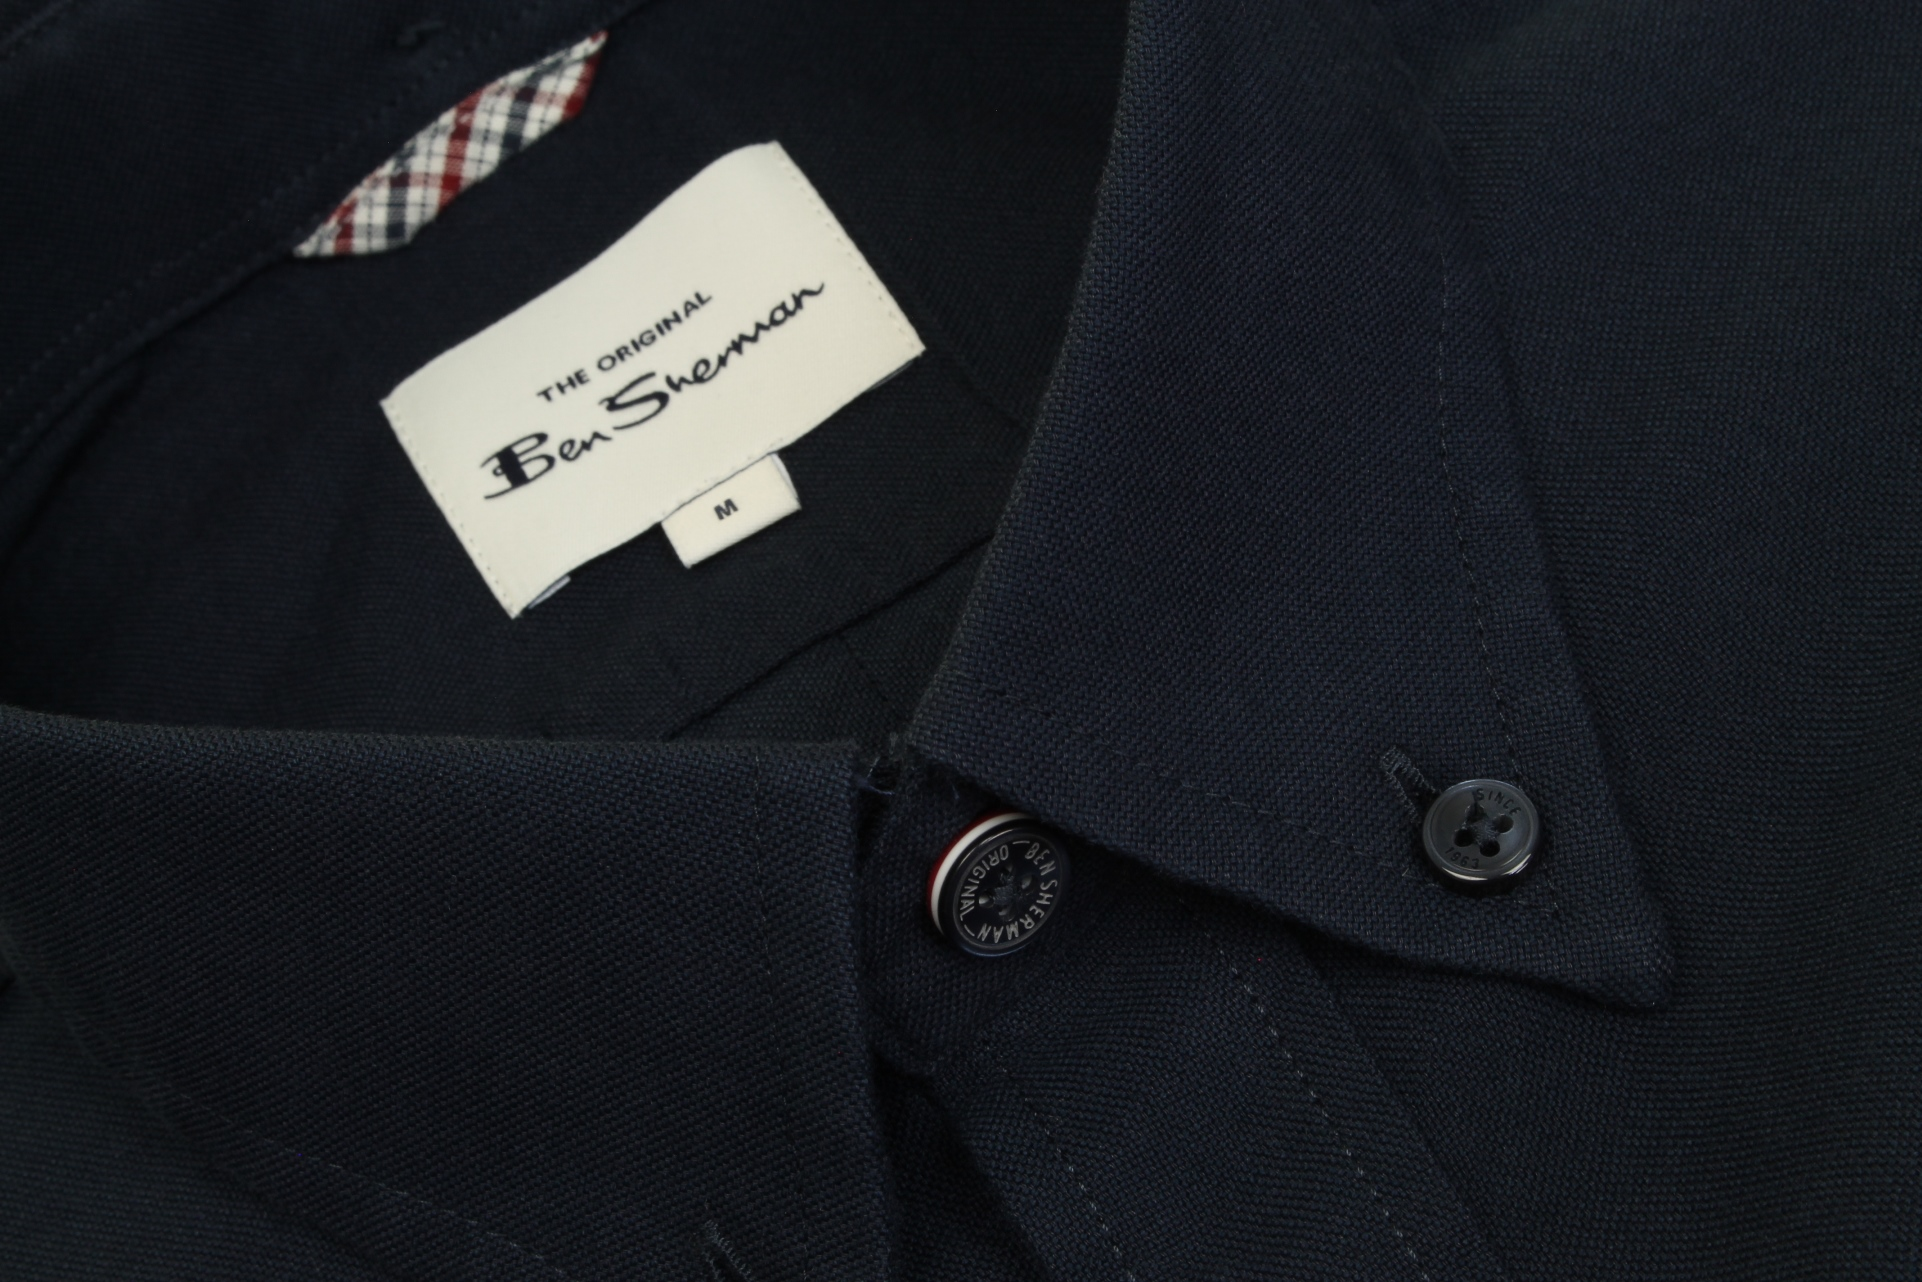 Mens-Oxford-Shirt-by-Ben-Sherman-Long-Sleeved thumbnail 18